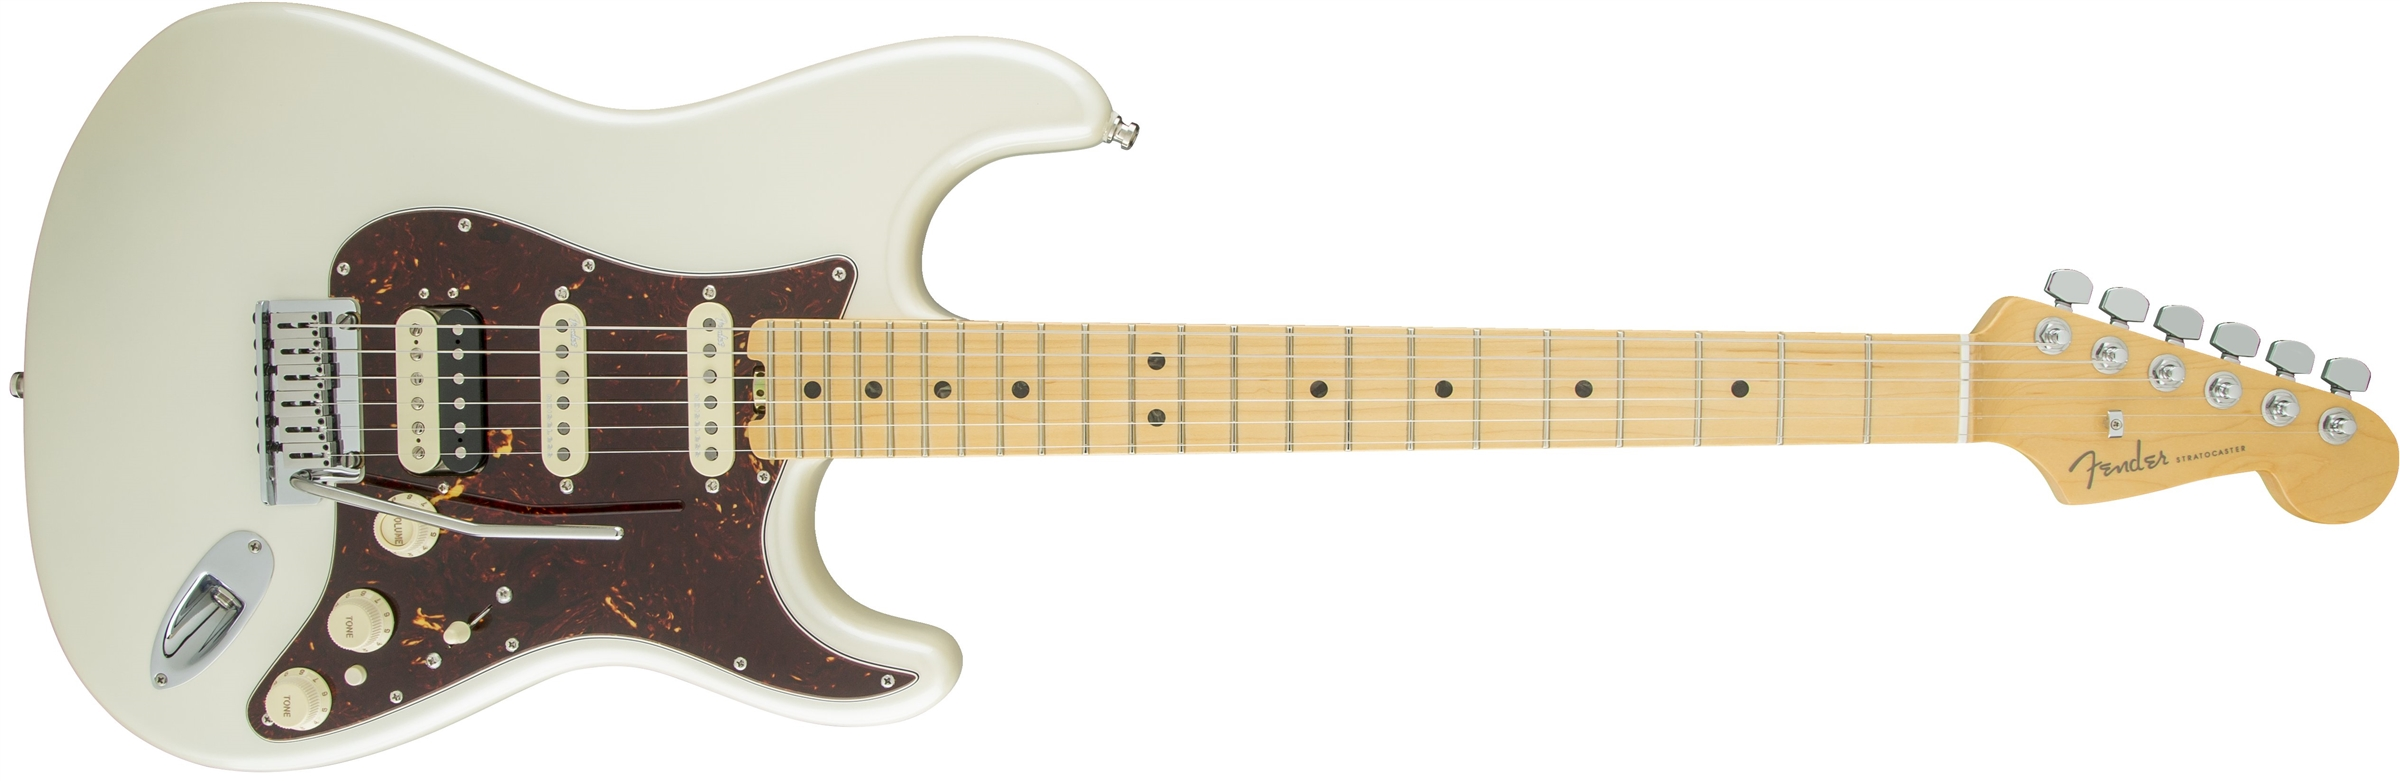 american elite stratocaster hss shawbucker electric guitars. Black Bedroom Furniture Sets. Home Design Ideas